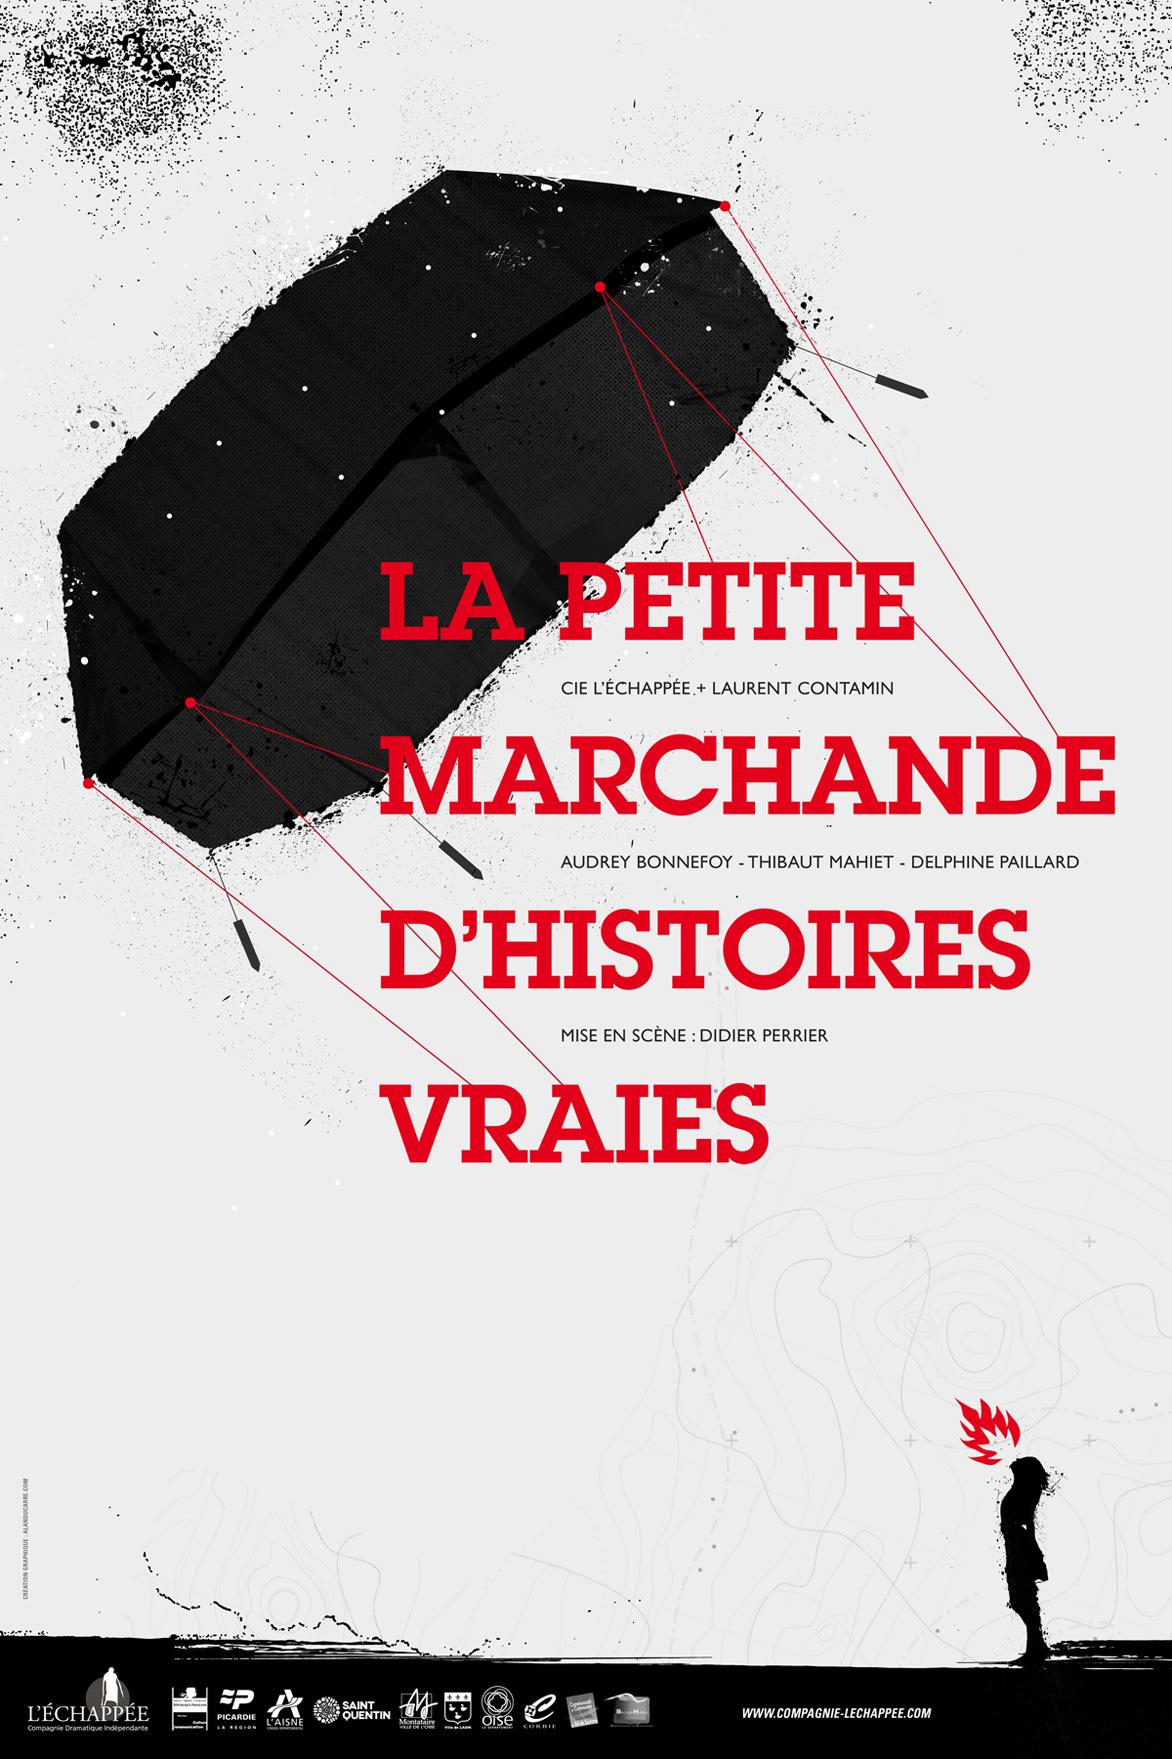 la_petite_marchande_slide1